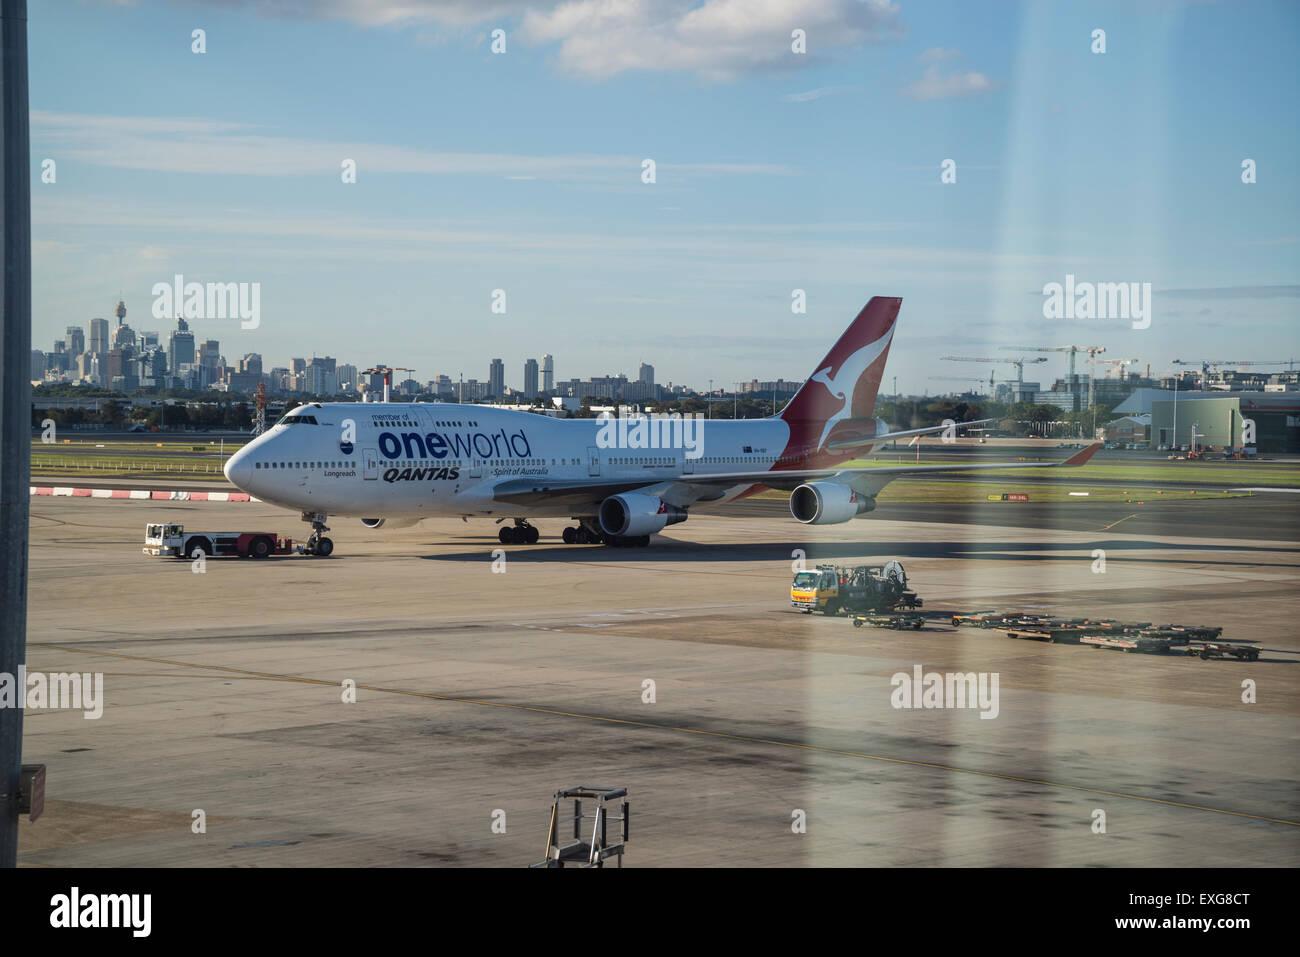 Sydney airport, Qantas one world aircraft, Australia Stock Photo